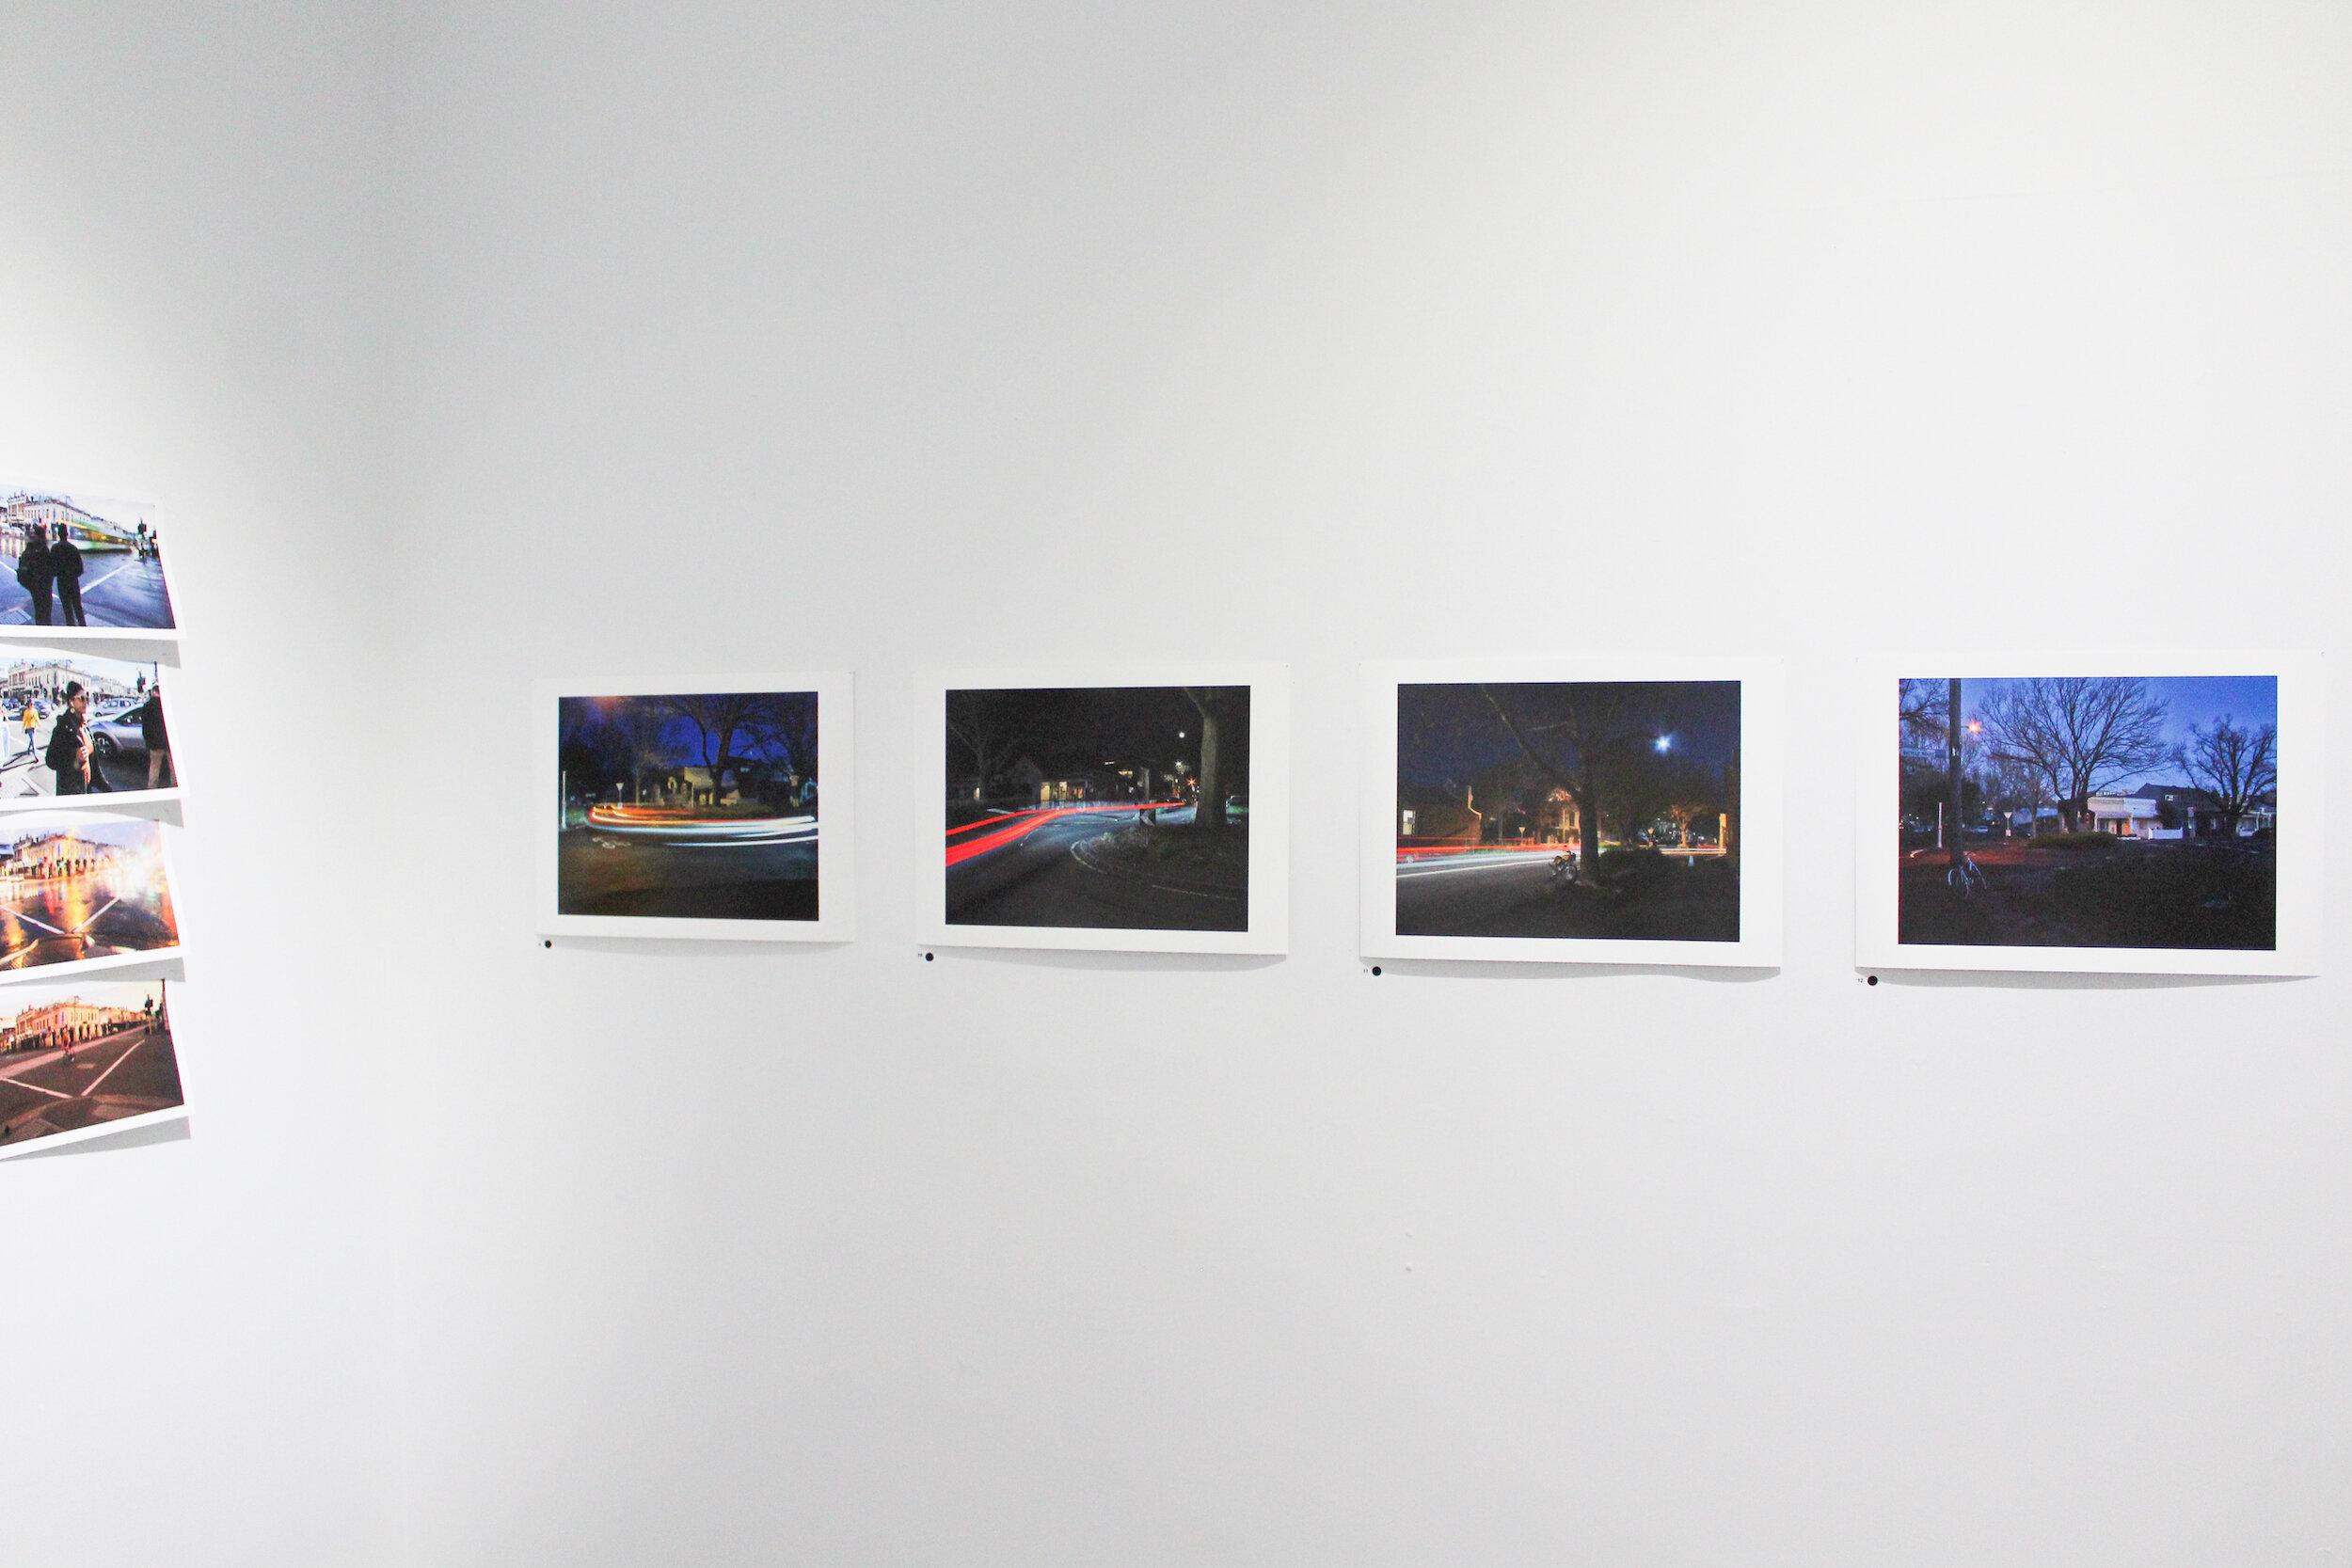 Jonathan Tversky.  Fitzroy Suburbia #1 , giclée print, 47 x 35cm,  Fitzroy Suburbia #2 , giclée print, 47 x 35cm,  Fitzroy Suburbia #3 , giclée print, 47 x 35cm,  Fitzroy Suburbia #4 , giclée print, 47 x 35cm